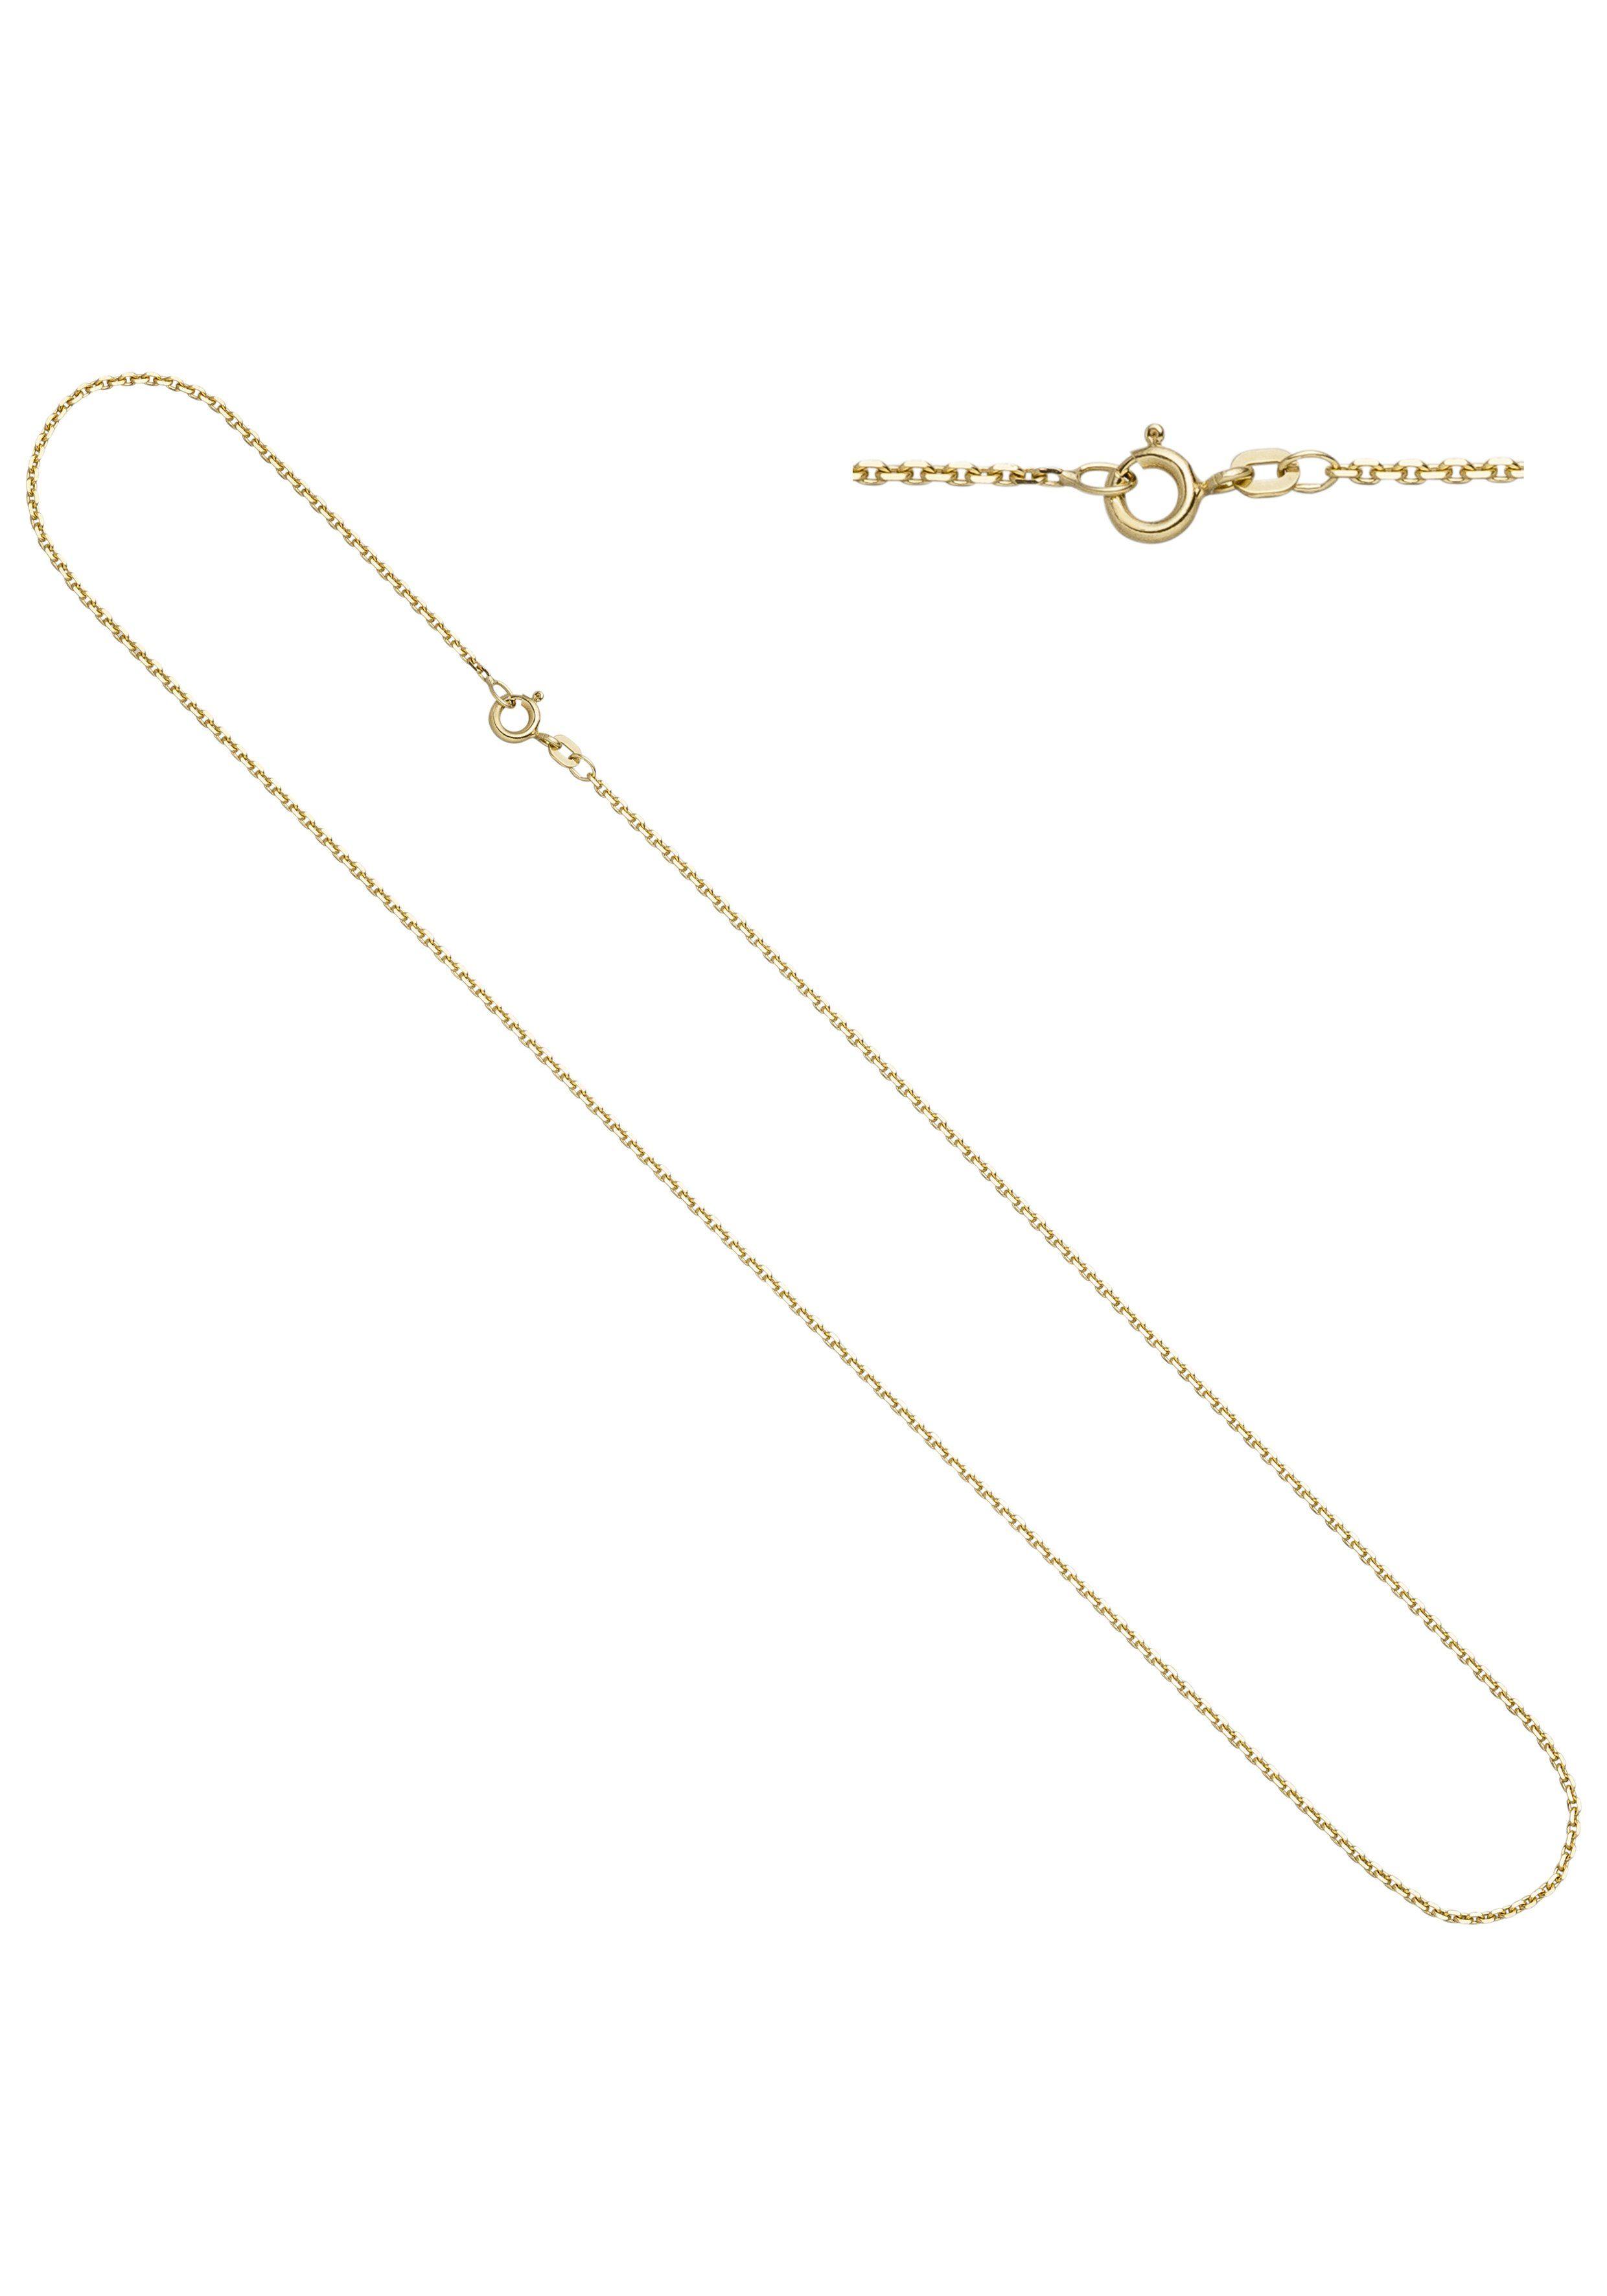 JOBO Goldkette Ankerkette 333 Gold diamantiert 50 cm 1,6 mm